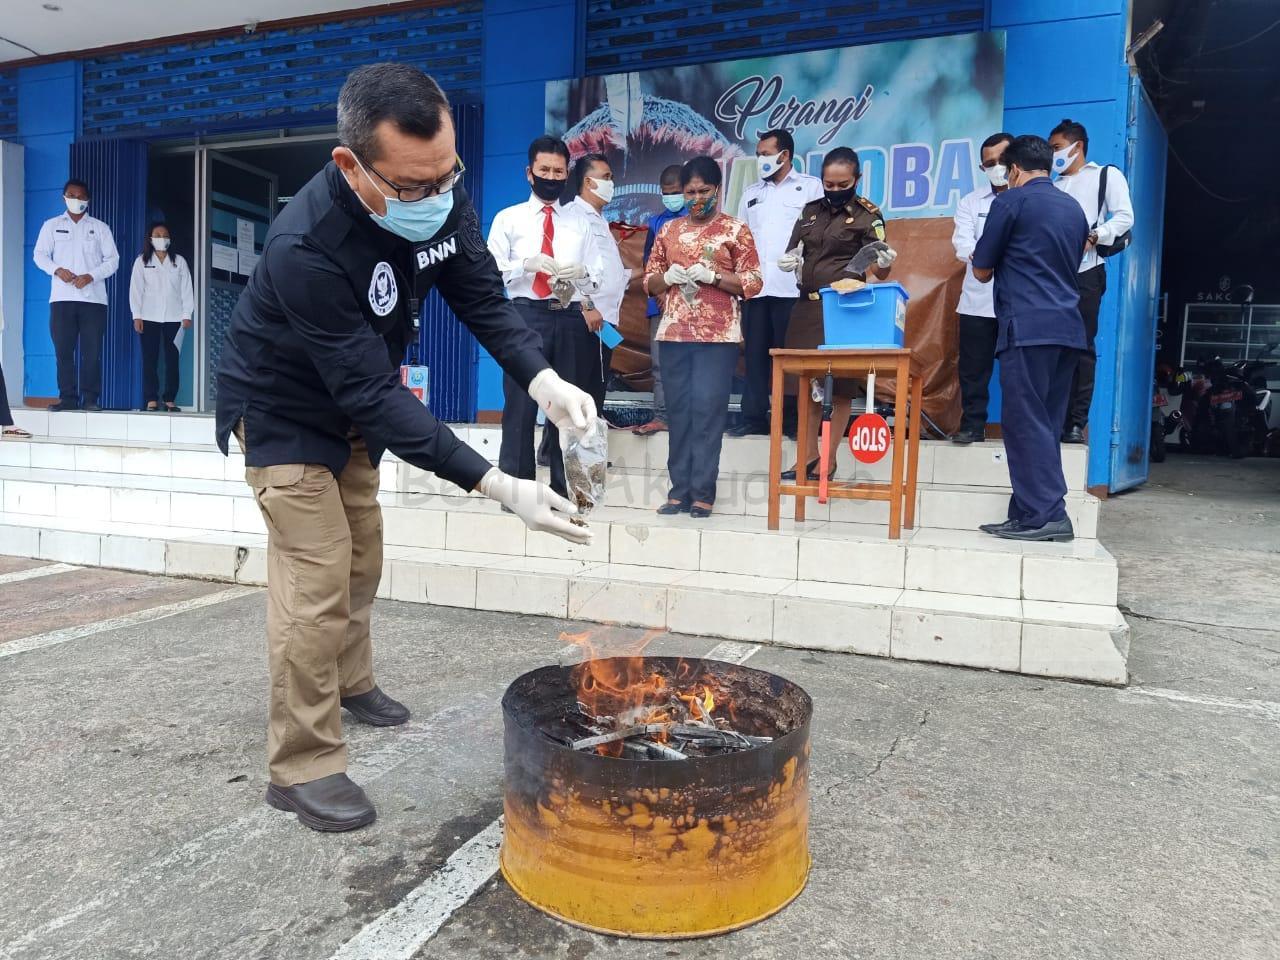 BNN Papua Barat Musnahkan 1.7 Kilogram Ganja 16 IMG 20200907 WA0030